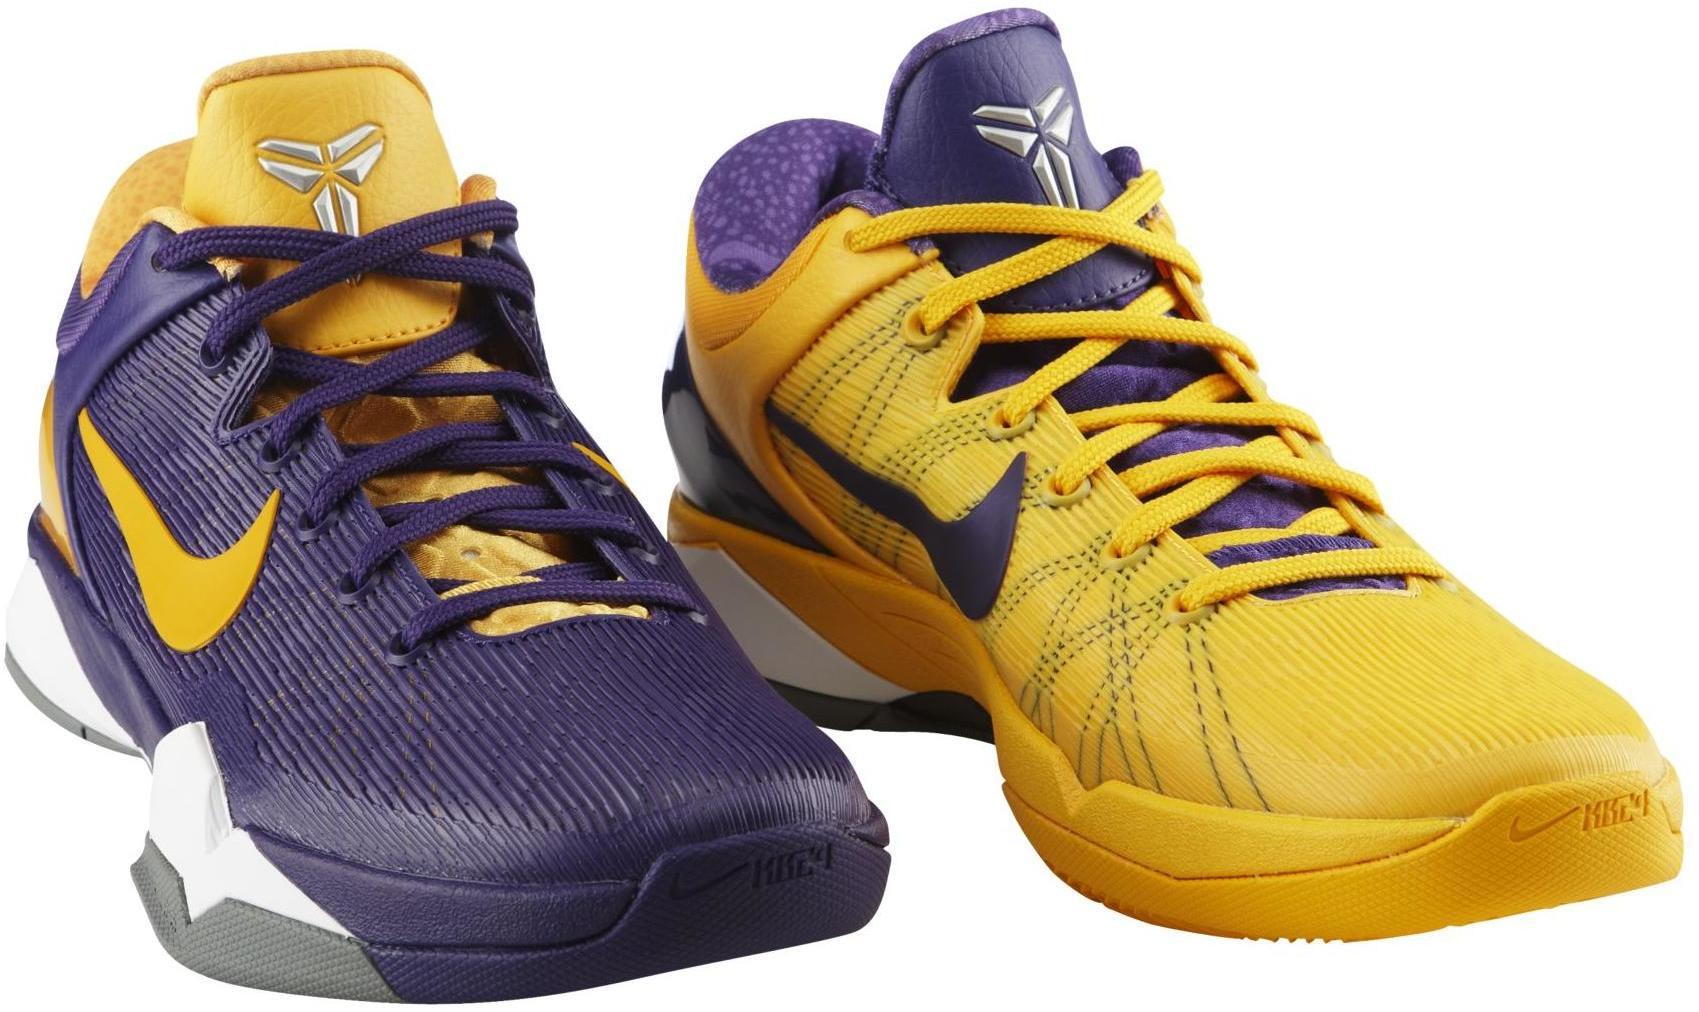 Nike Kobe 7 Yin and Yang - 488371-501